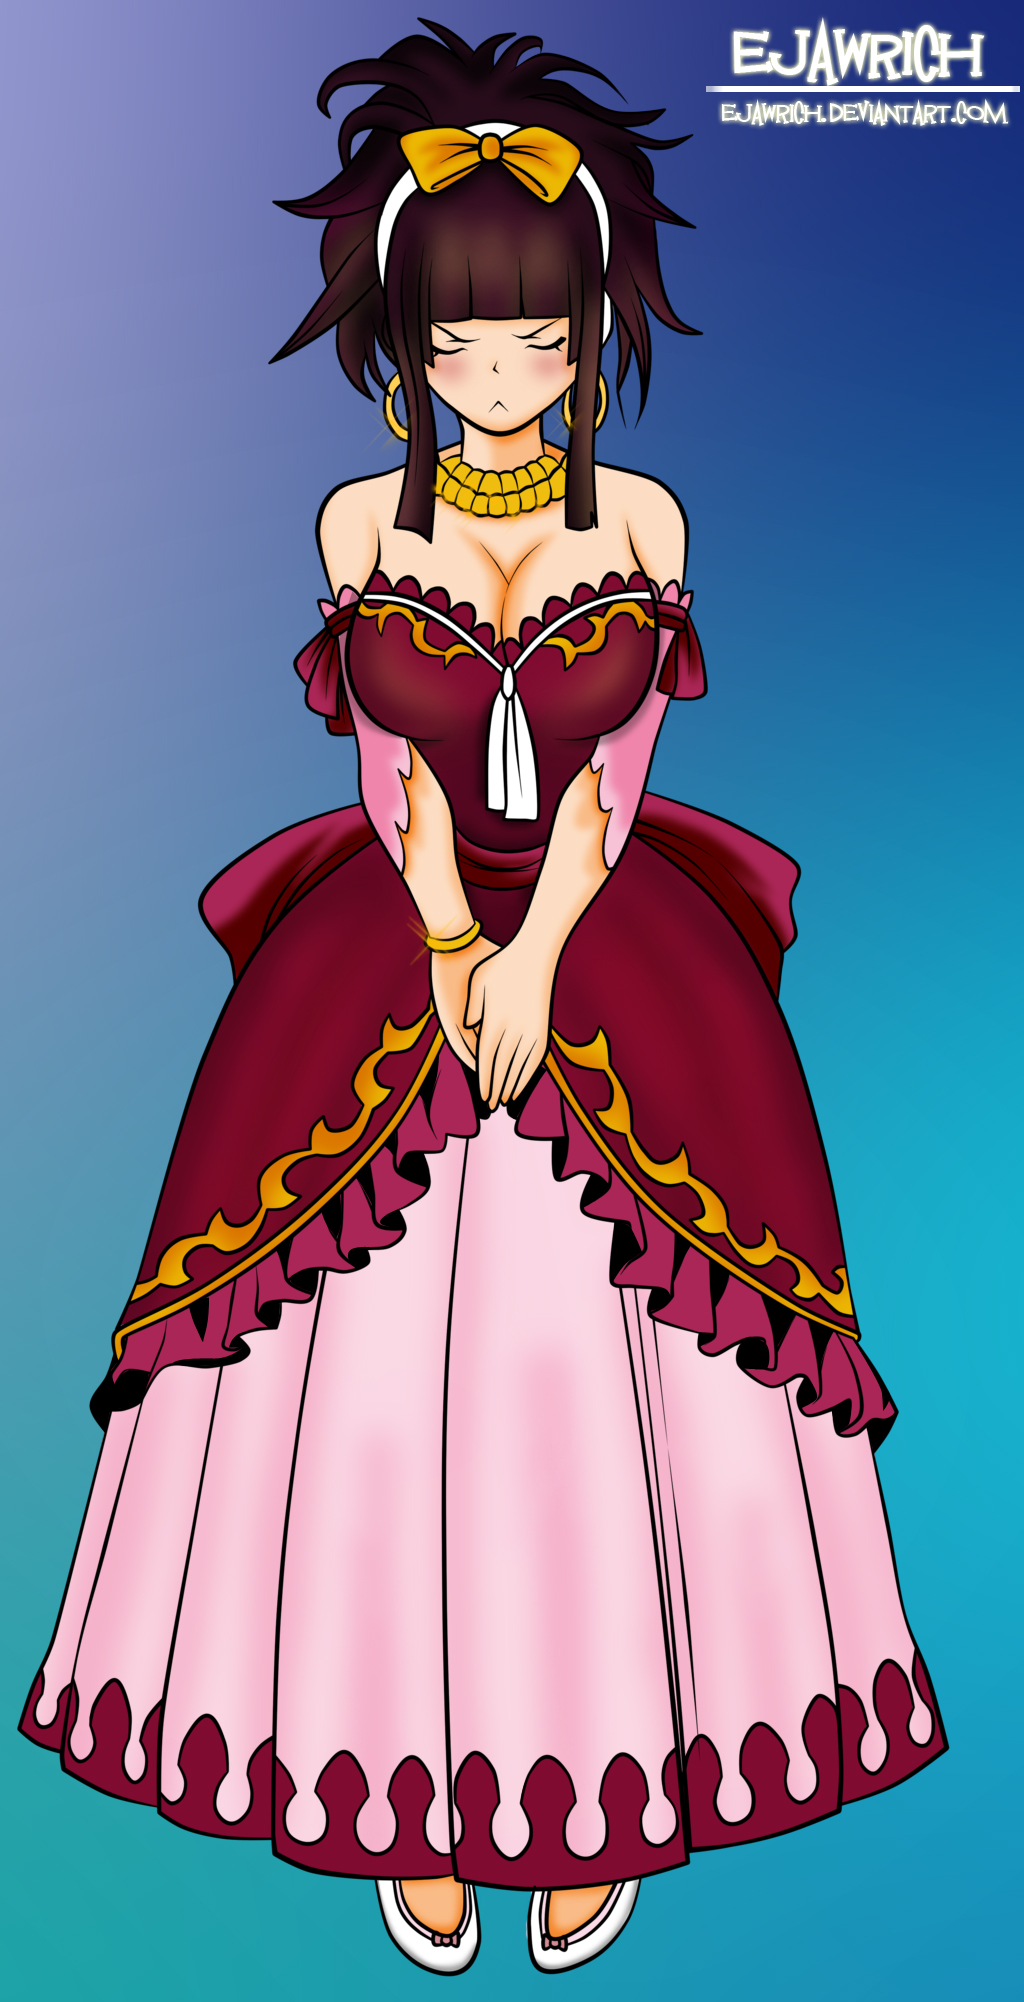 Fairy Tail 338 Kagura On Dress By Ejawrich On DeviantArt